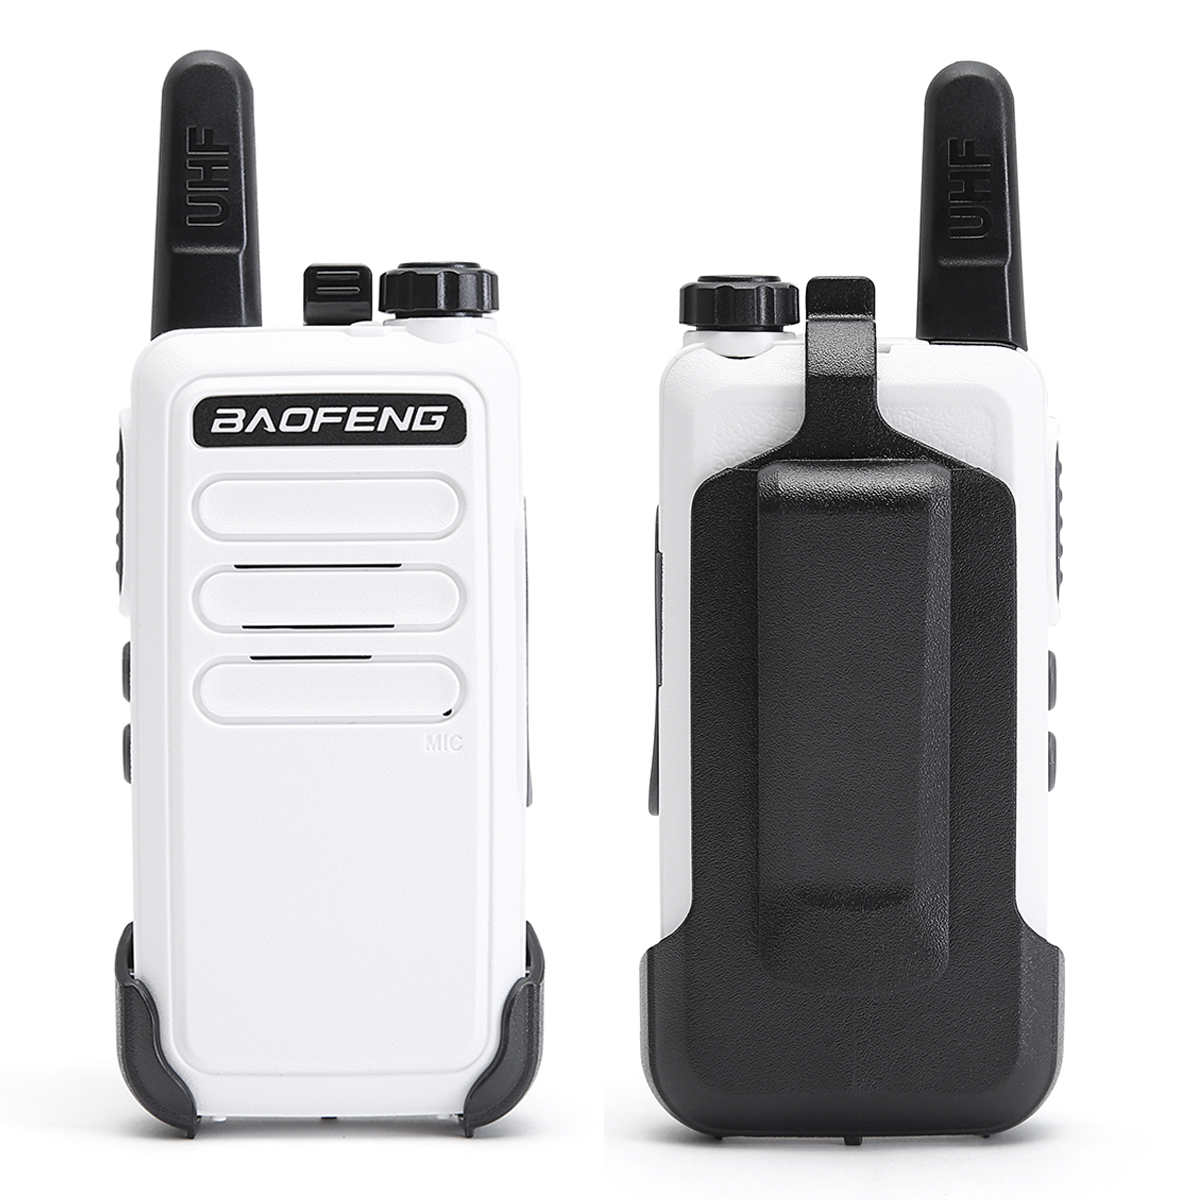 4 Pcs Baofeng BF-C9 Mini Walkie Talkie 400-470MHz UHF Two Way Radio Portable VOX USB Charging Handheld Transceiver